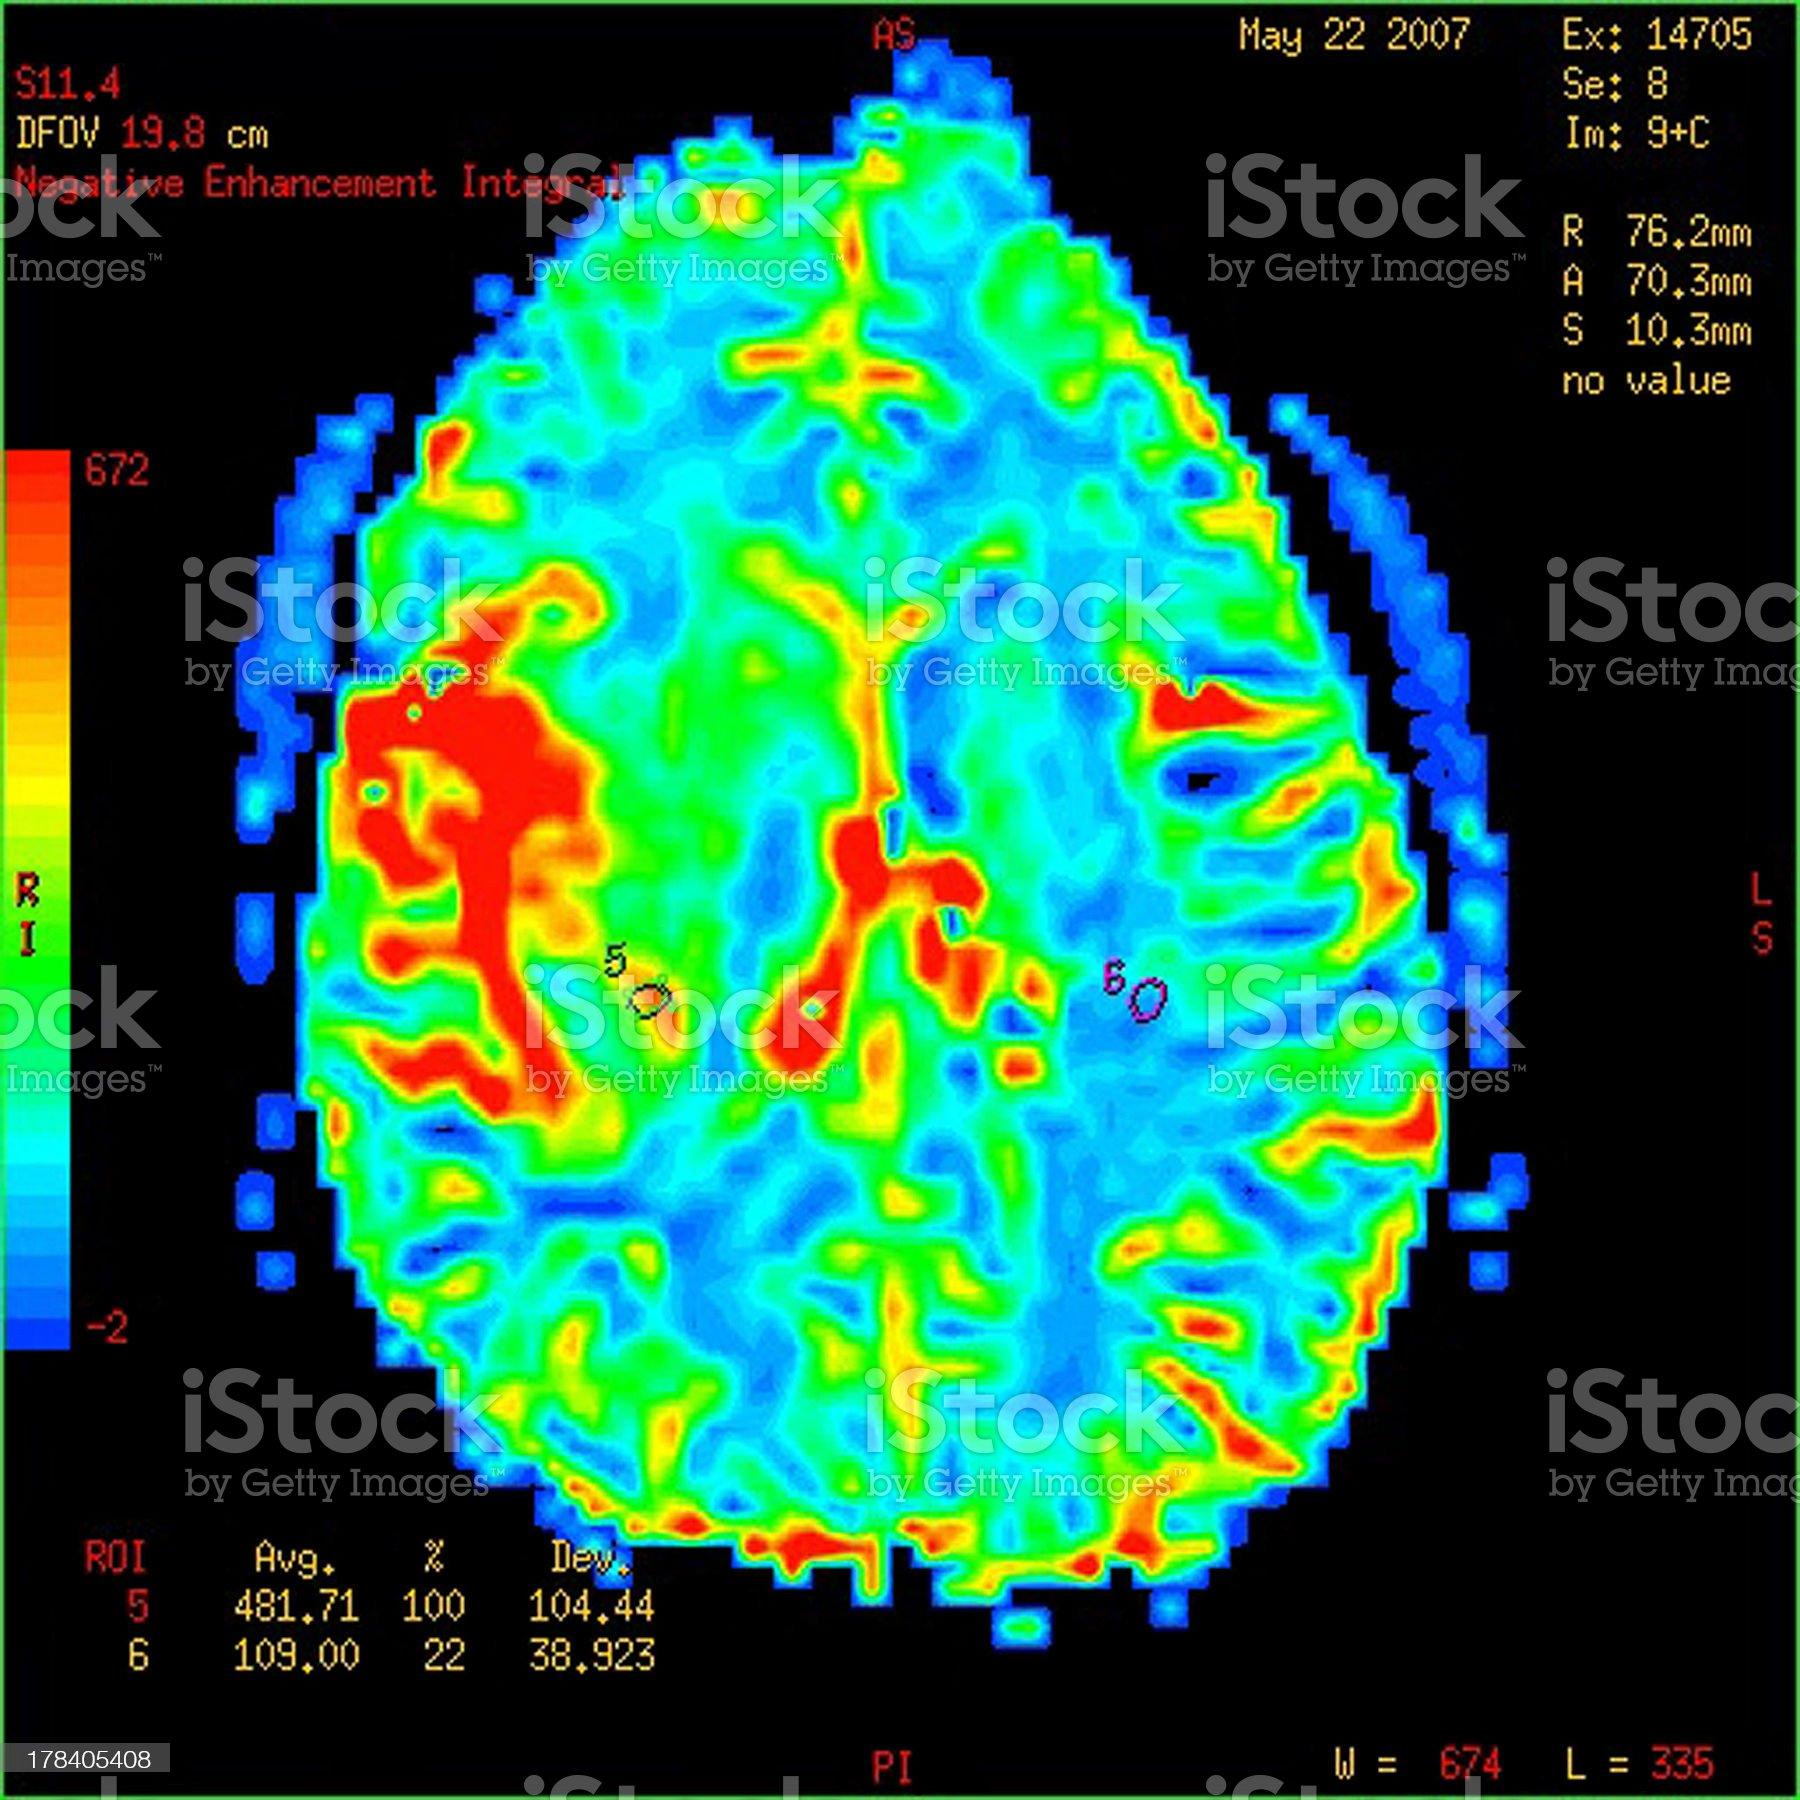 Perfusion MRI imaging of a malignant brain tumor royalty-free stock photo